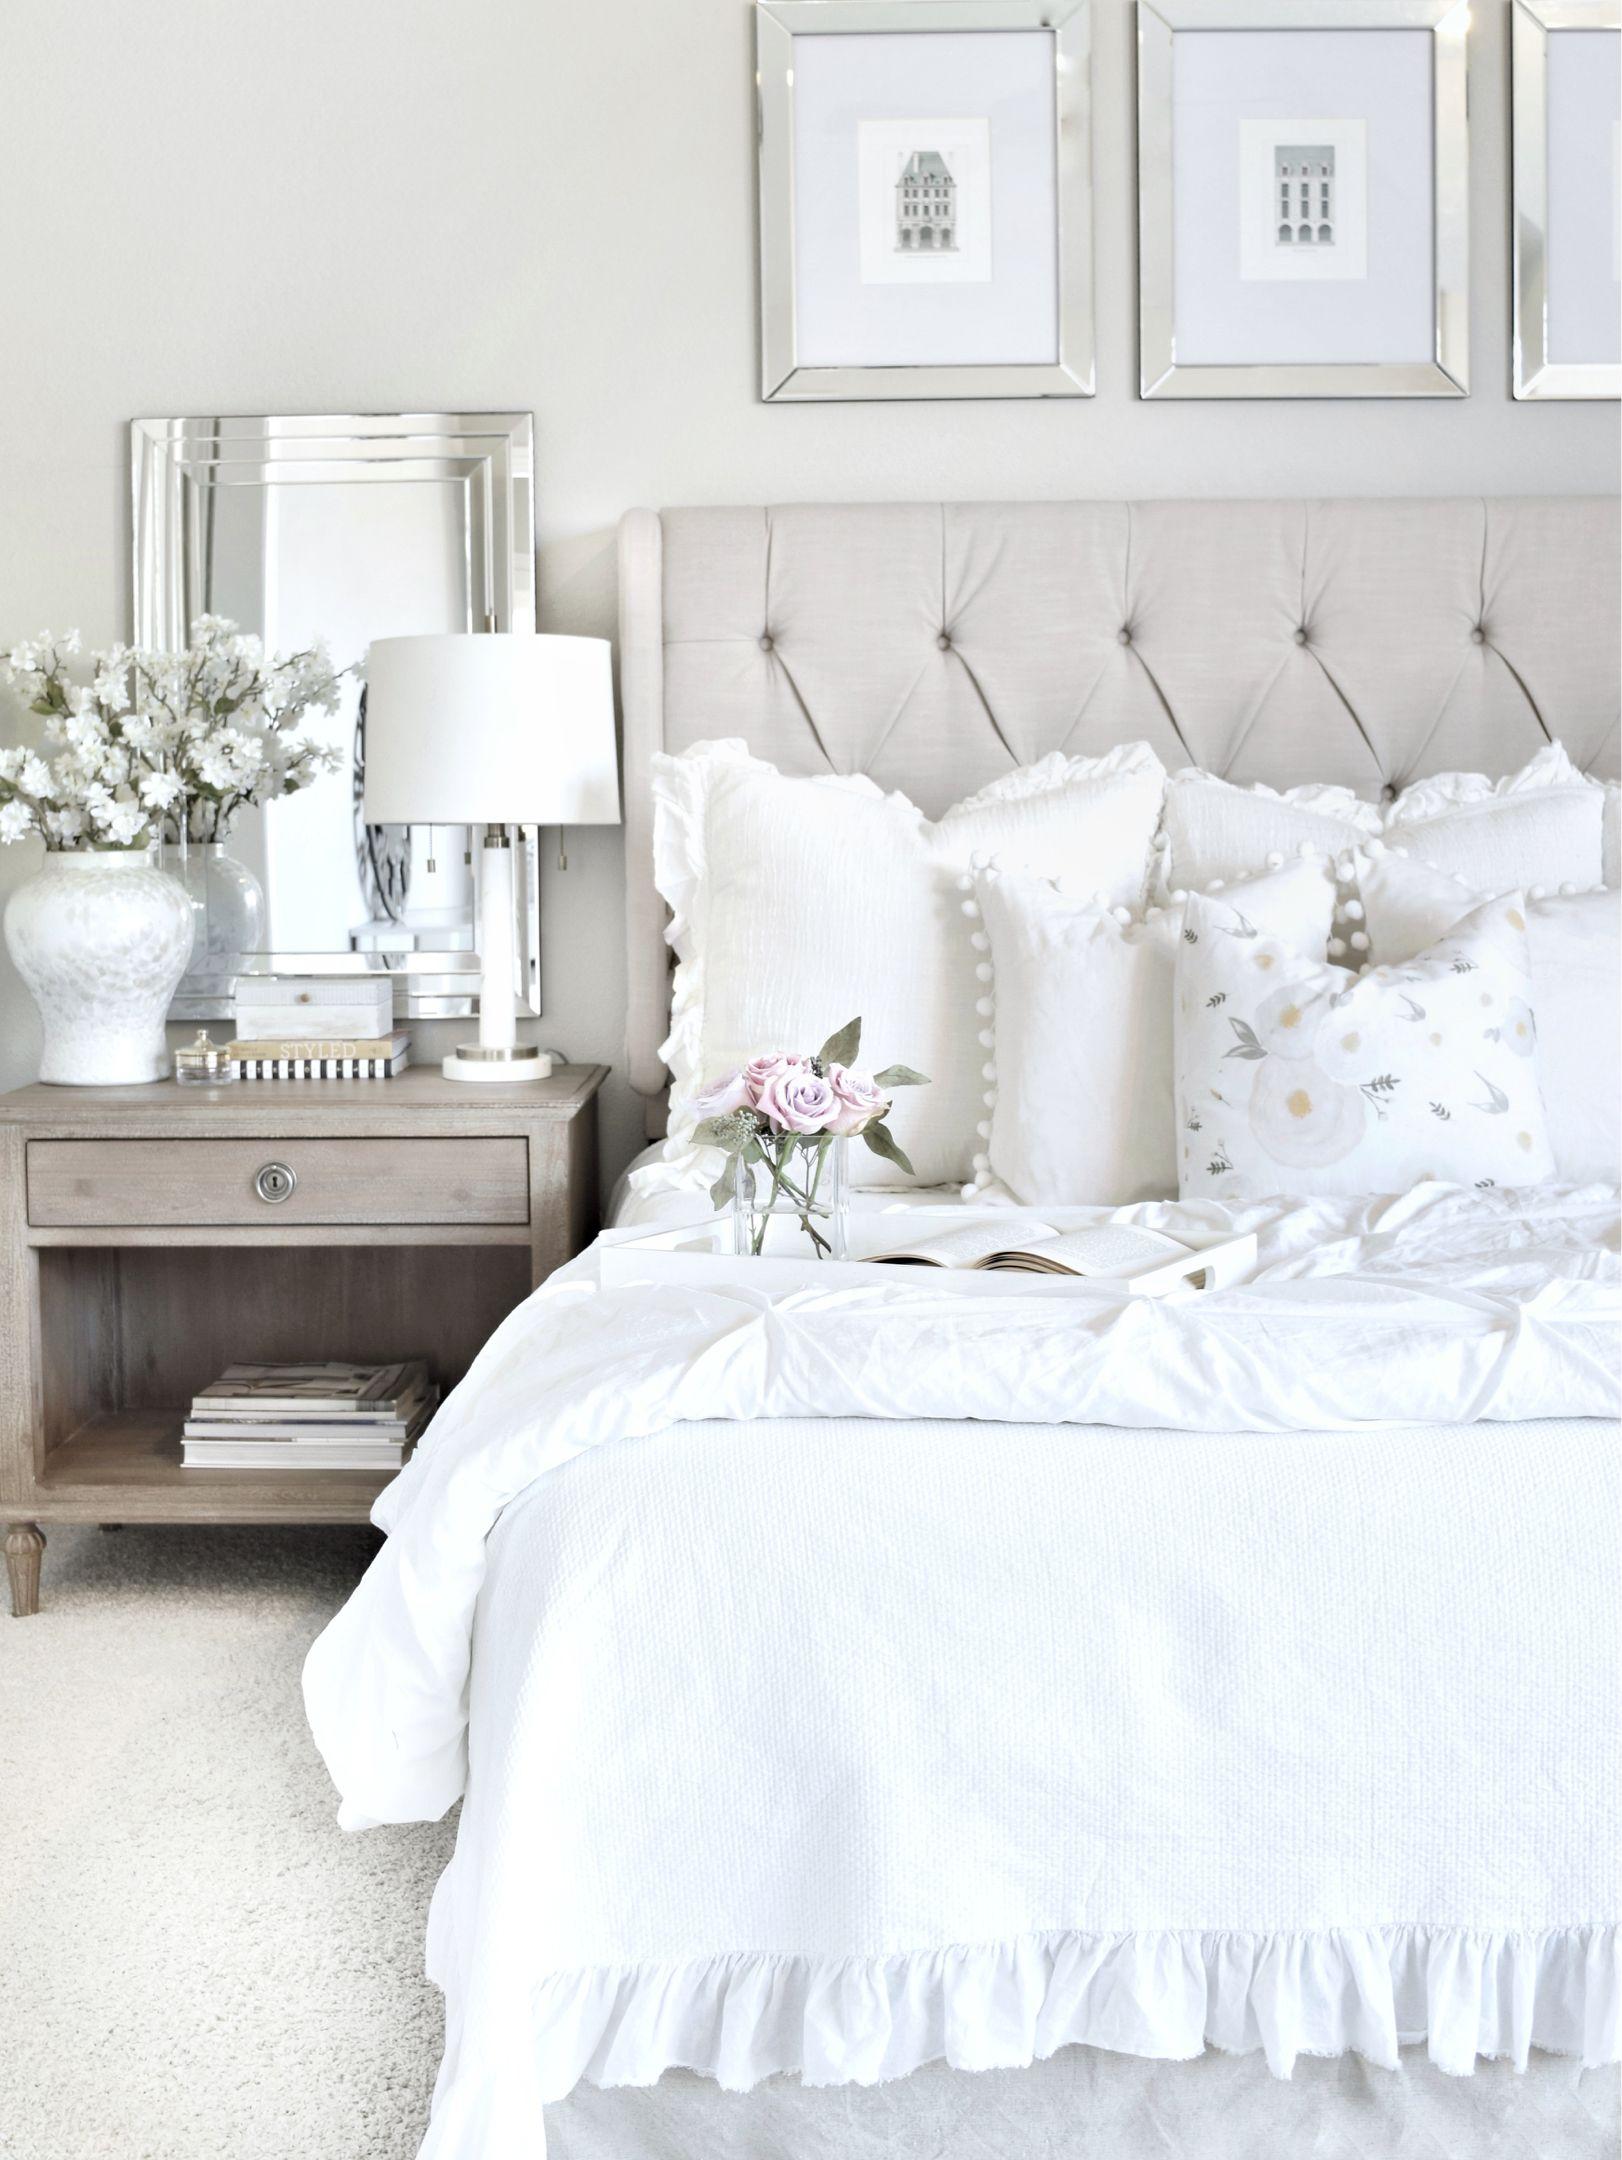 liketoknow.it http://liketk.it/2qoY5 #liketkit   cozy bedroom ...